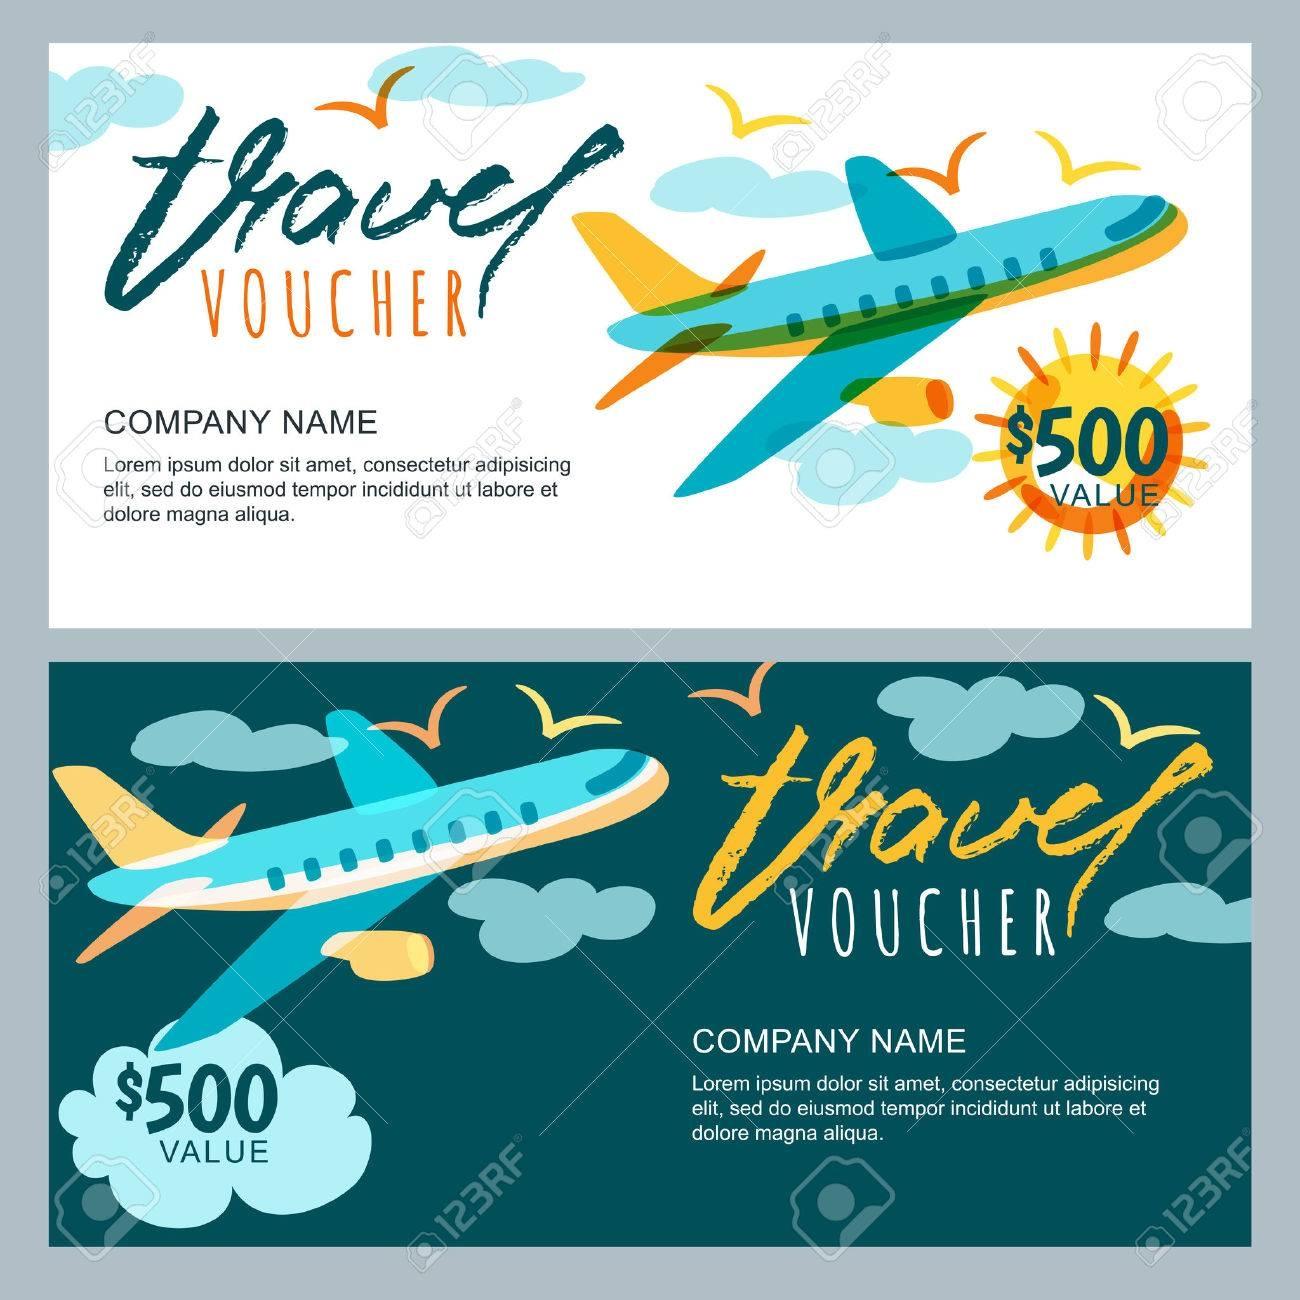 Travel Voucher Certificate Templates